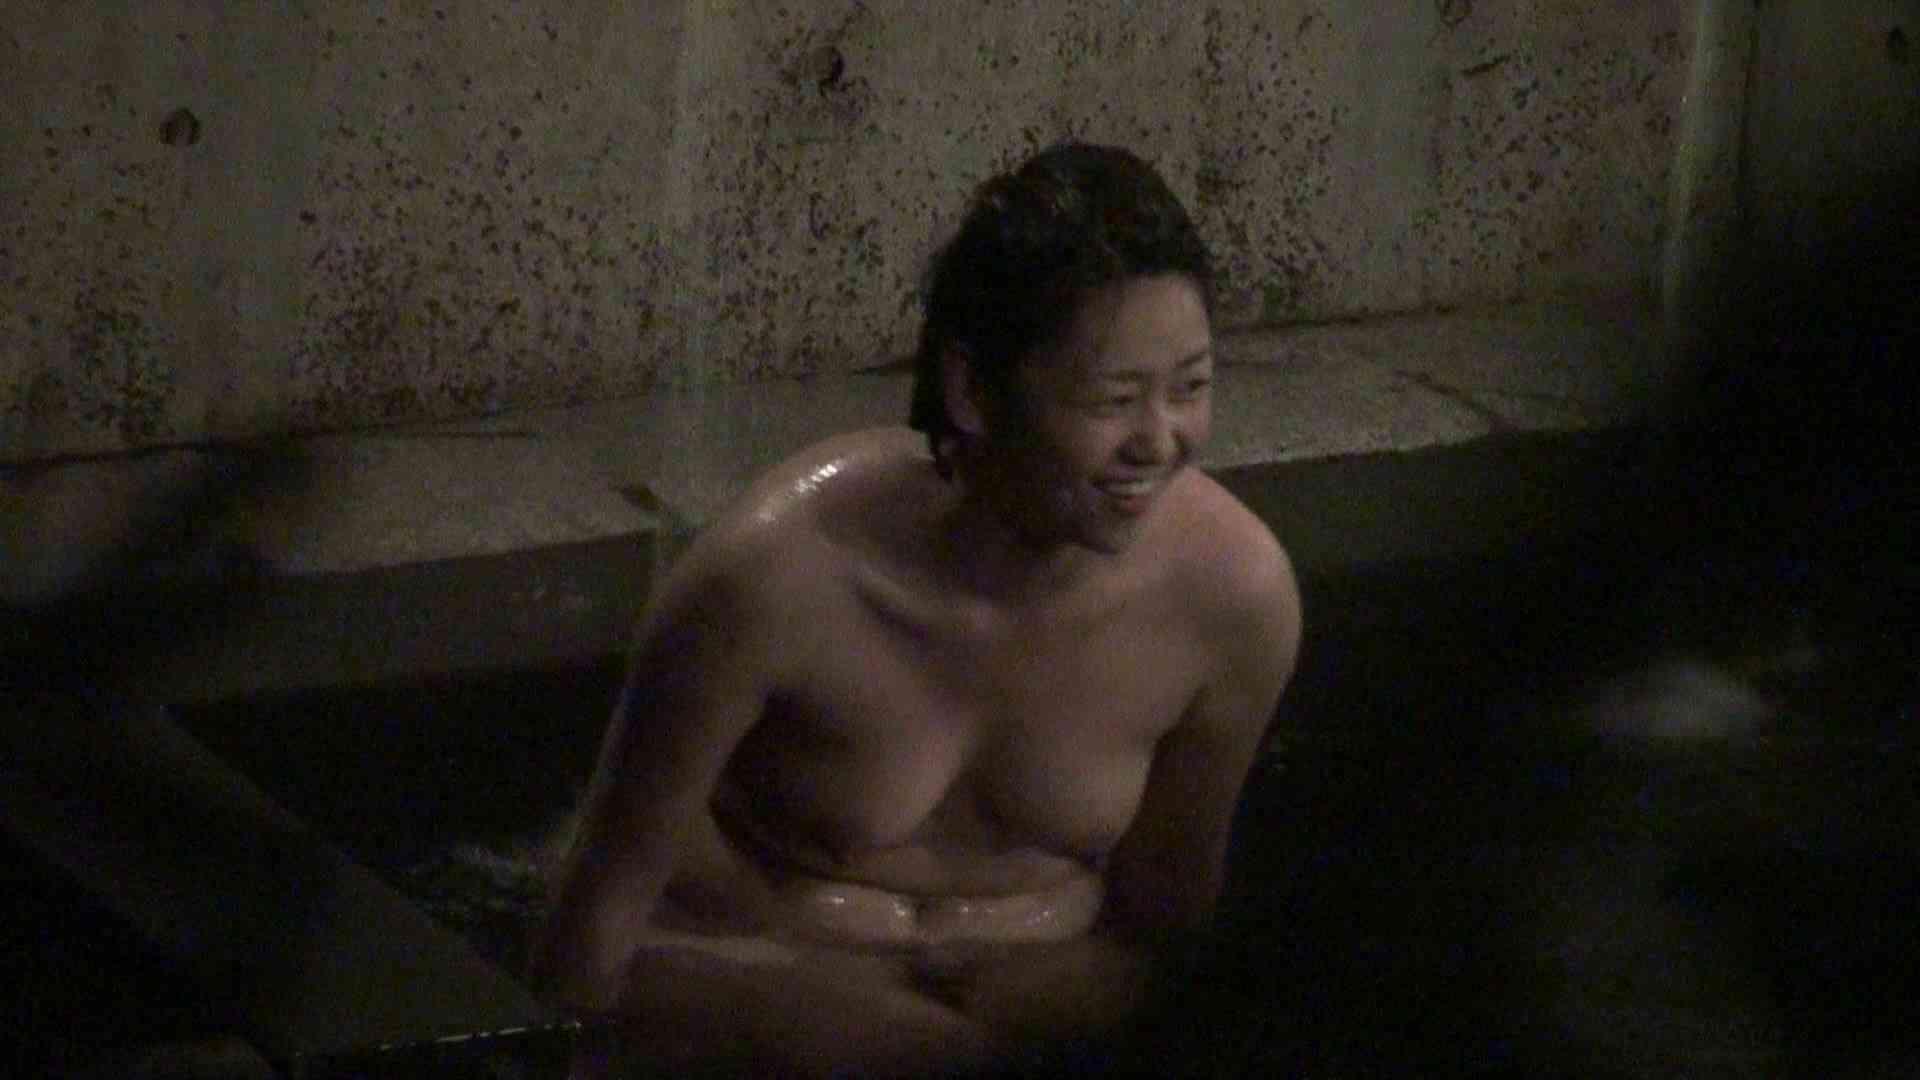 Aquaな露天風呂Vol.342 OLすけべ画像 | 露天  96連発 67